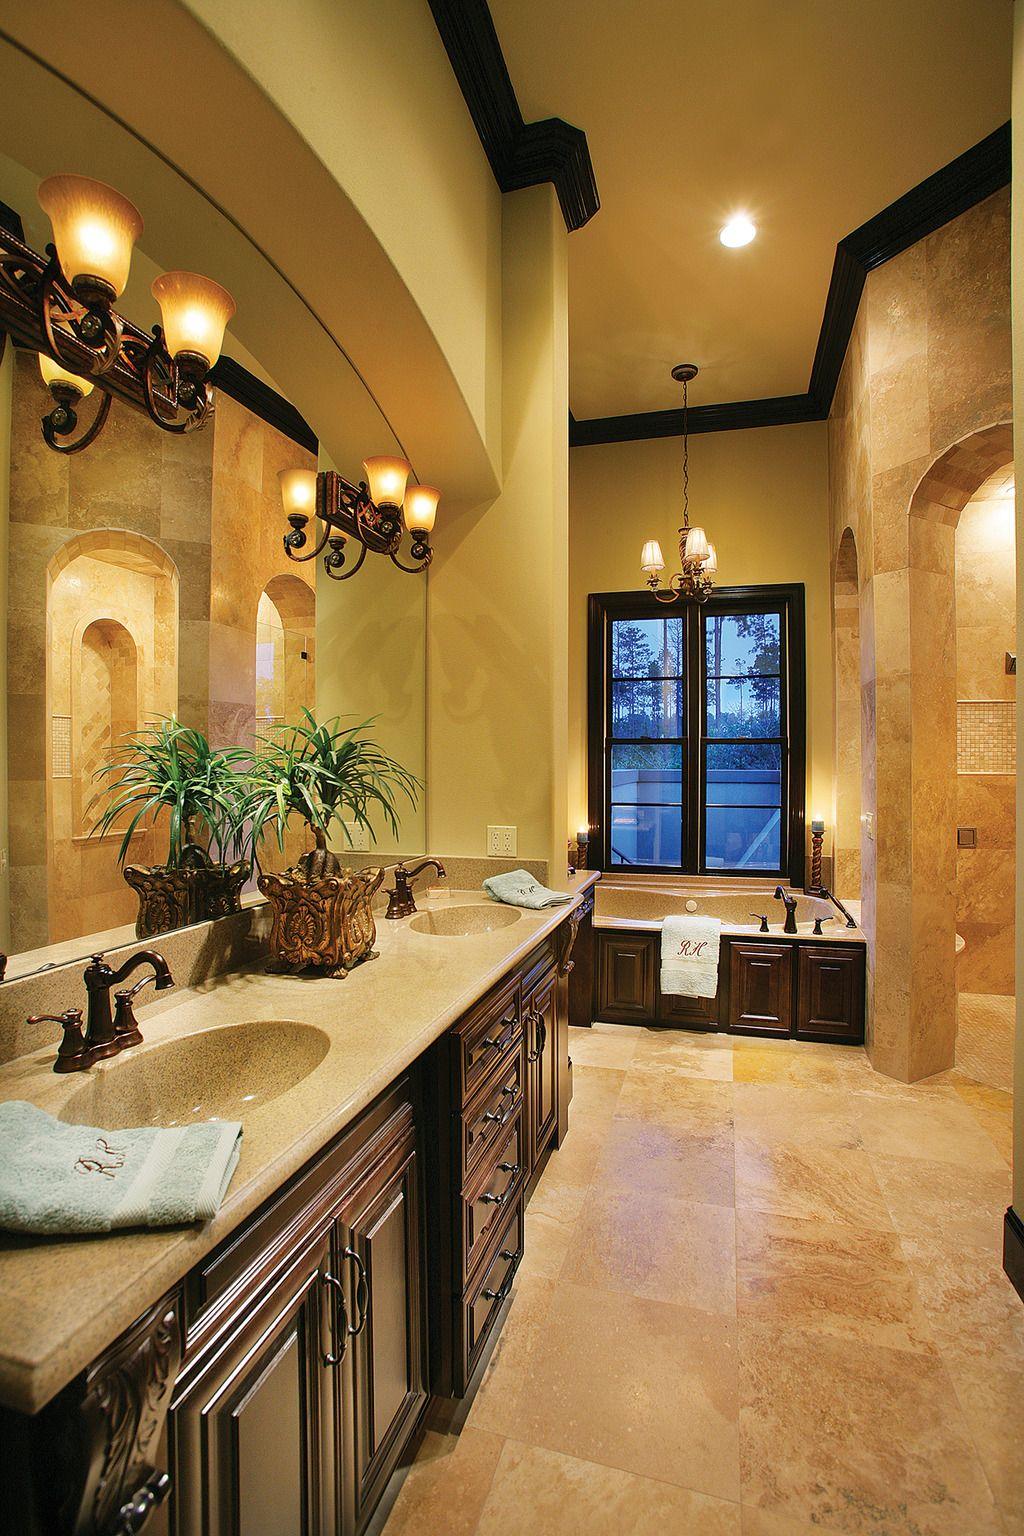 Mediterranean Style House Plan 4 Beds 5 Baths 3031 Sq Ft Plan 930 22 Tuscan Bathroom Decor Tuscan Bathroom Tuscan House